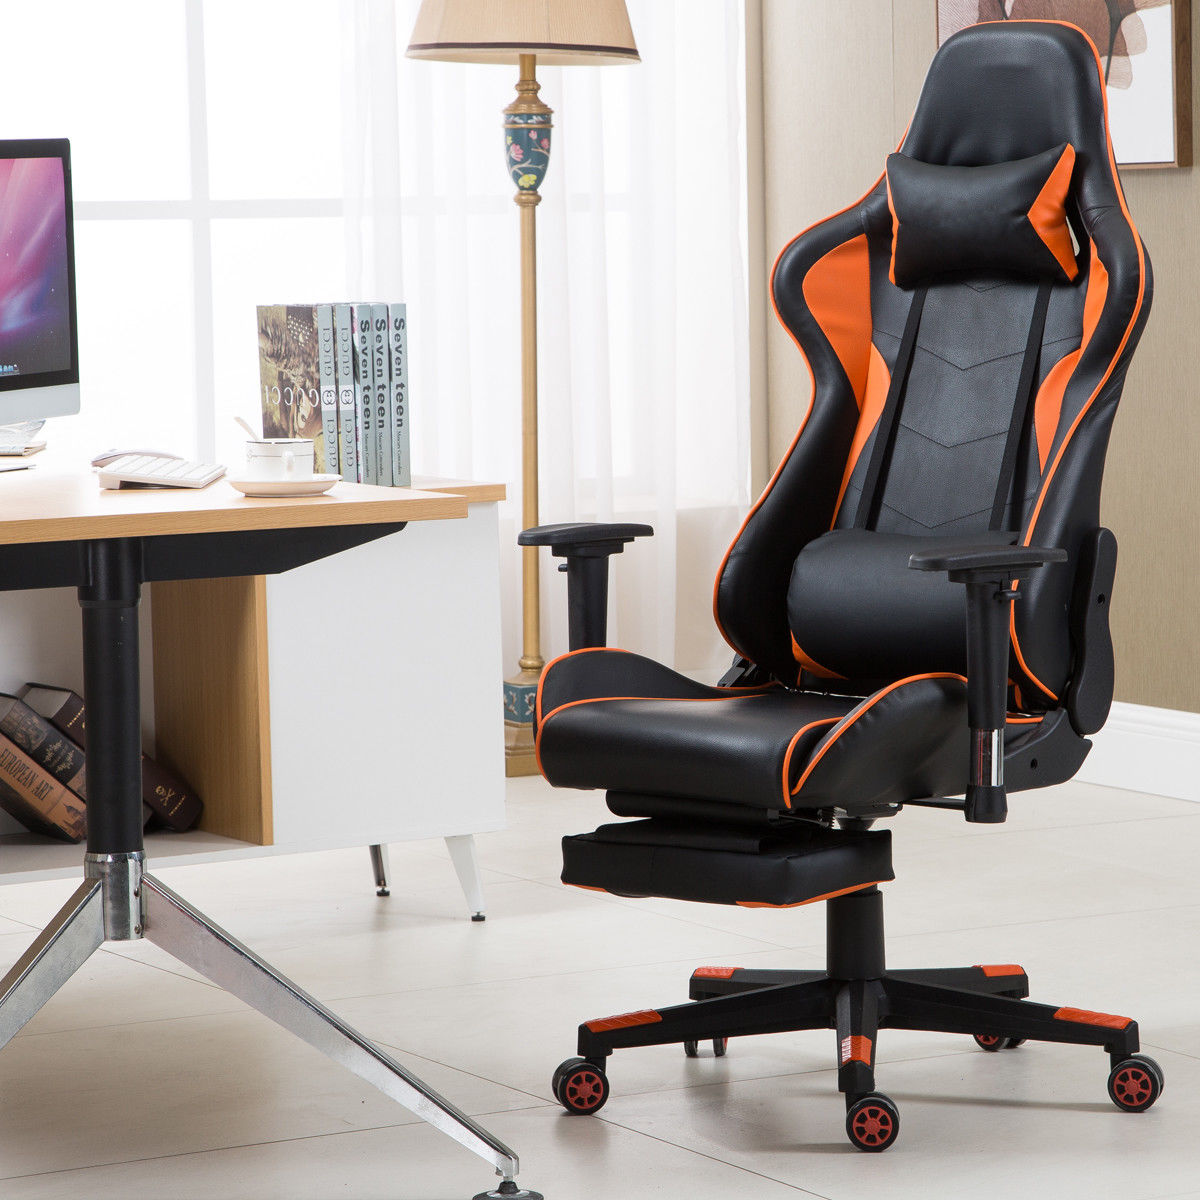 lumbar support office chair swing qatar goplus gaming high back racing recliner w footrest walmart com